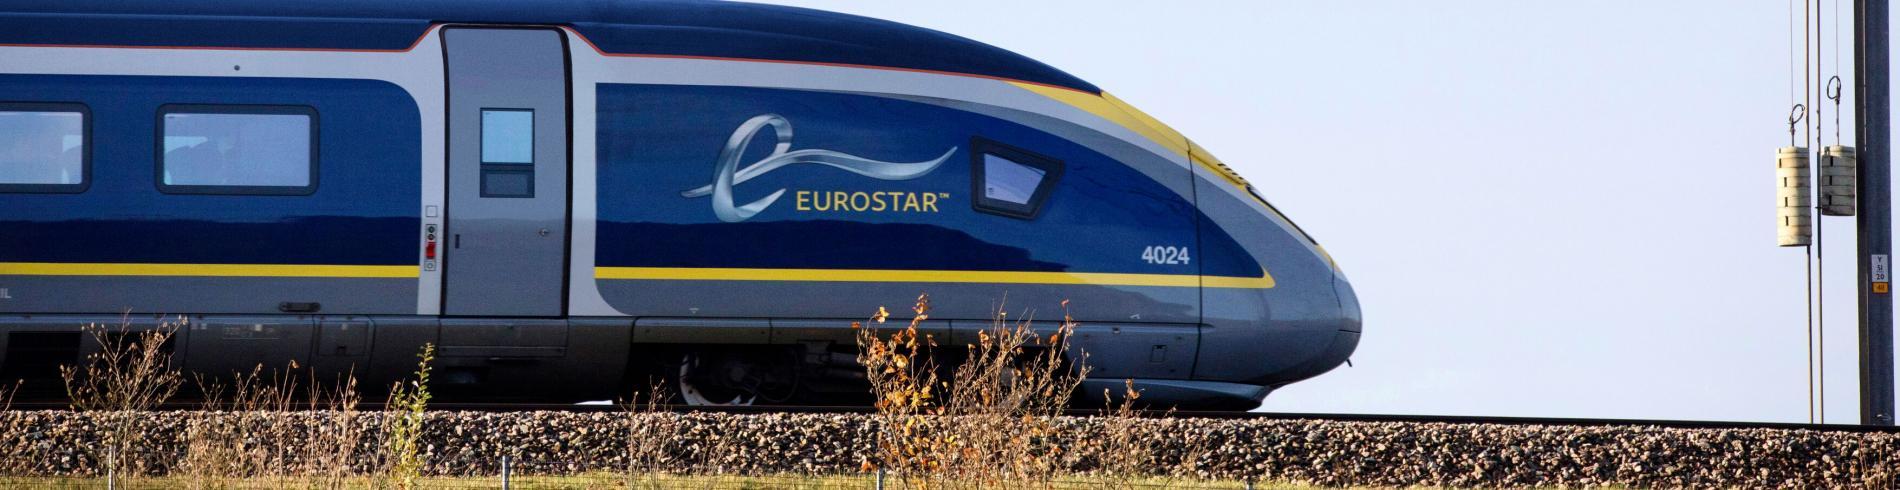 eurostar train on the move